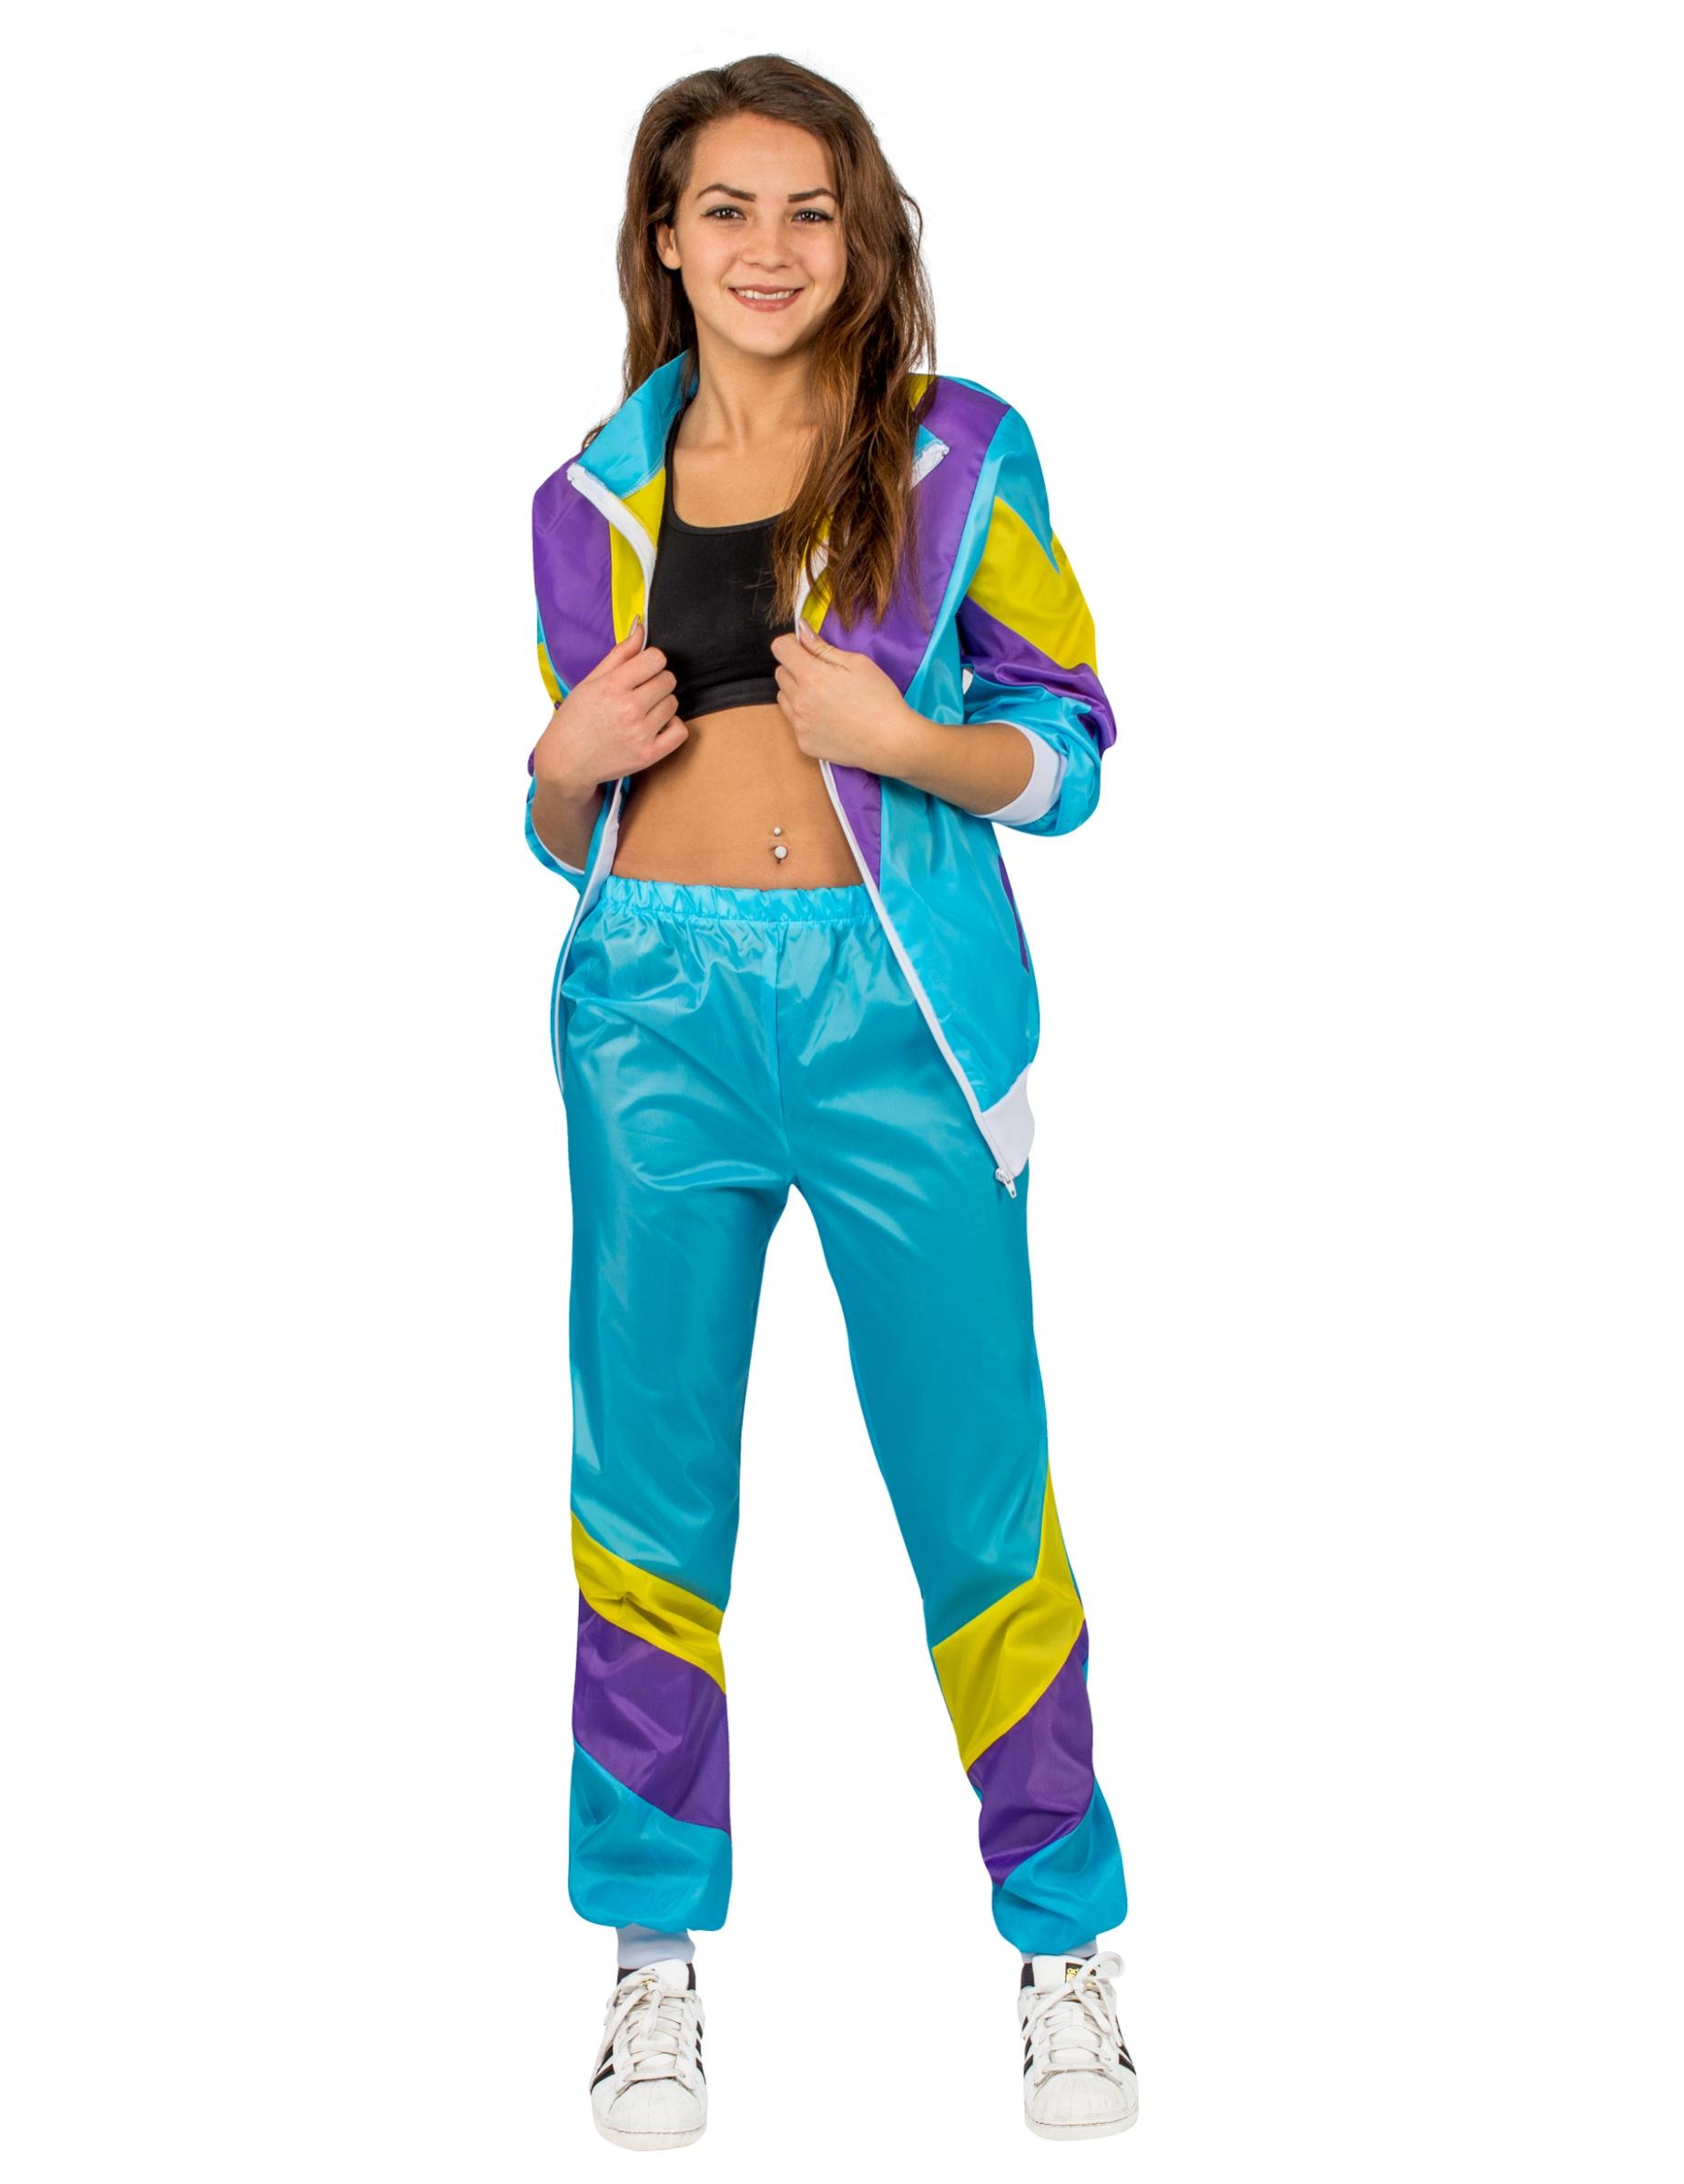 Costume anni u0026#39;80 adulto Costumi adultie vestiti di carnevale online - Vegaoo